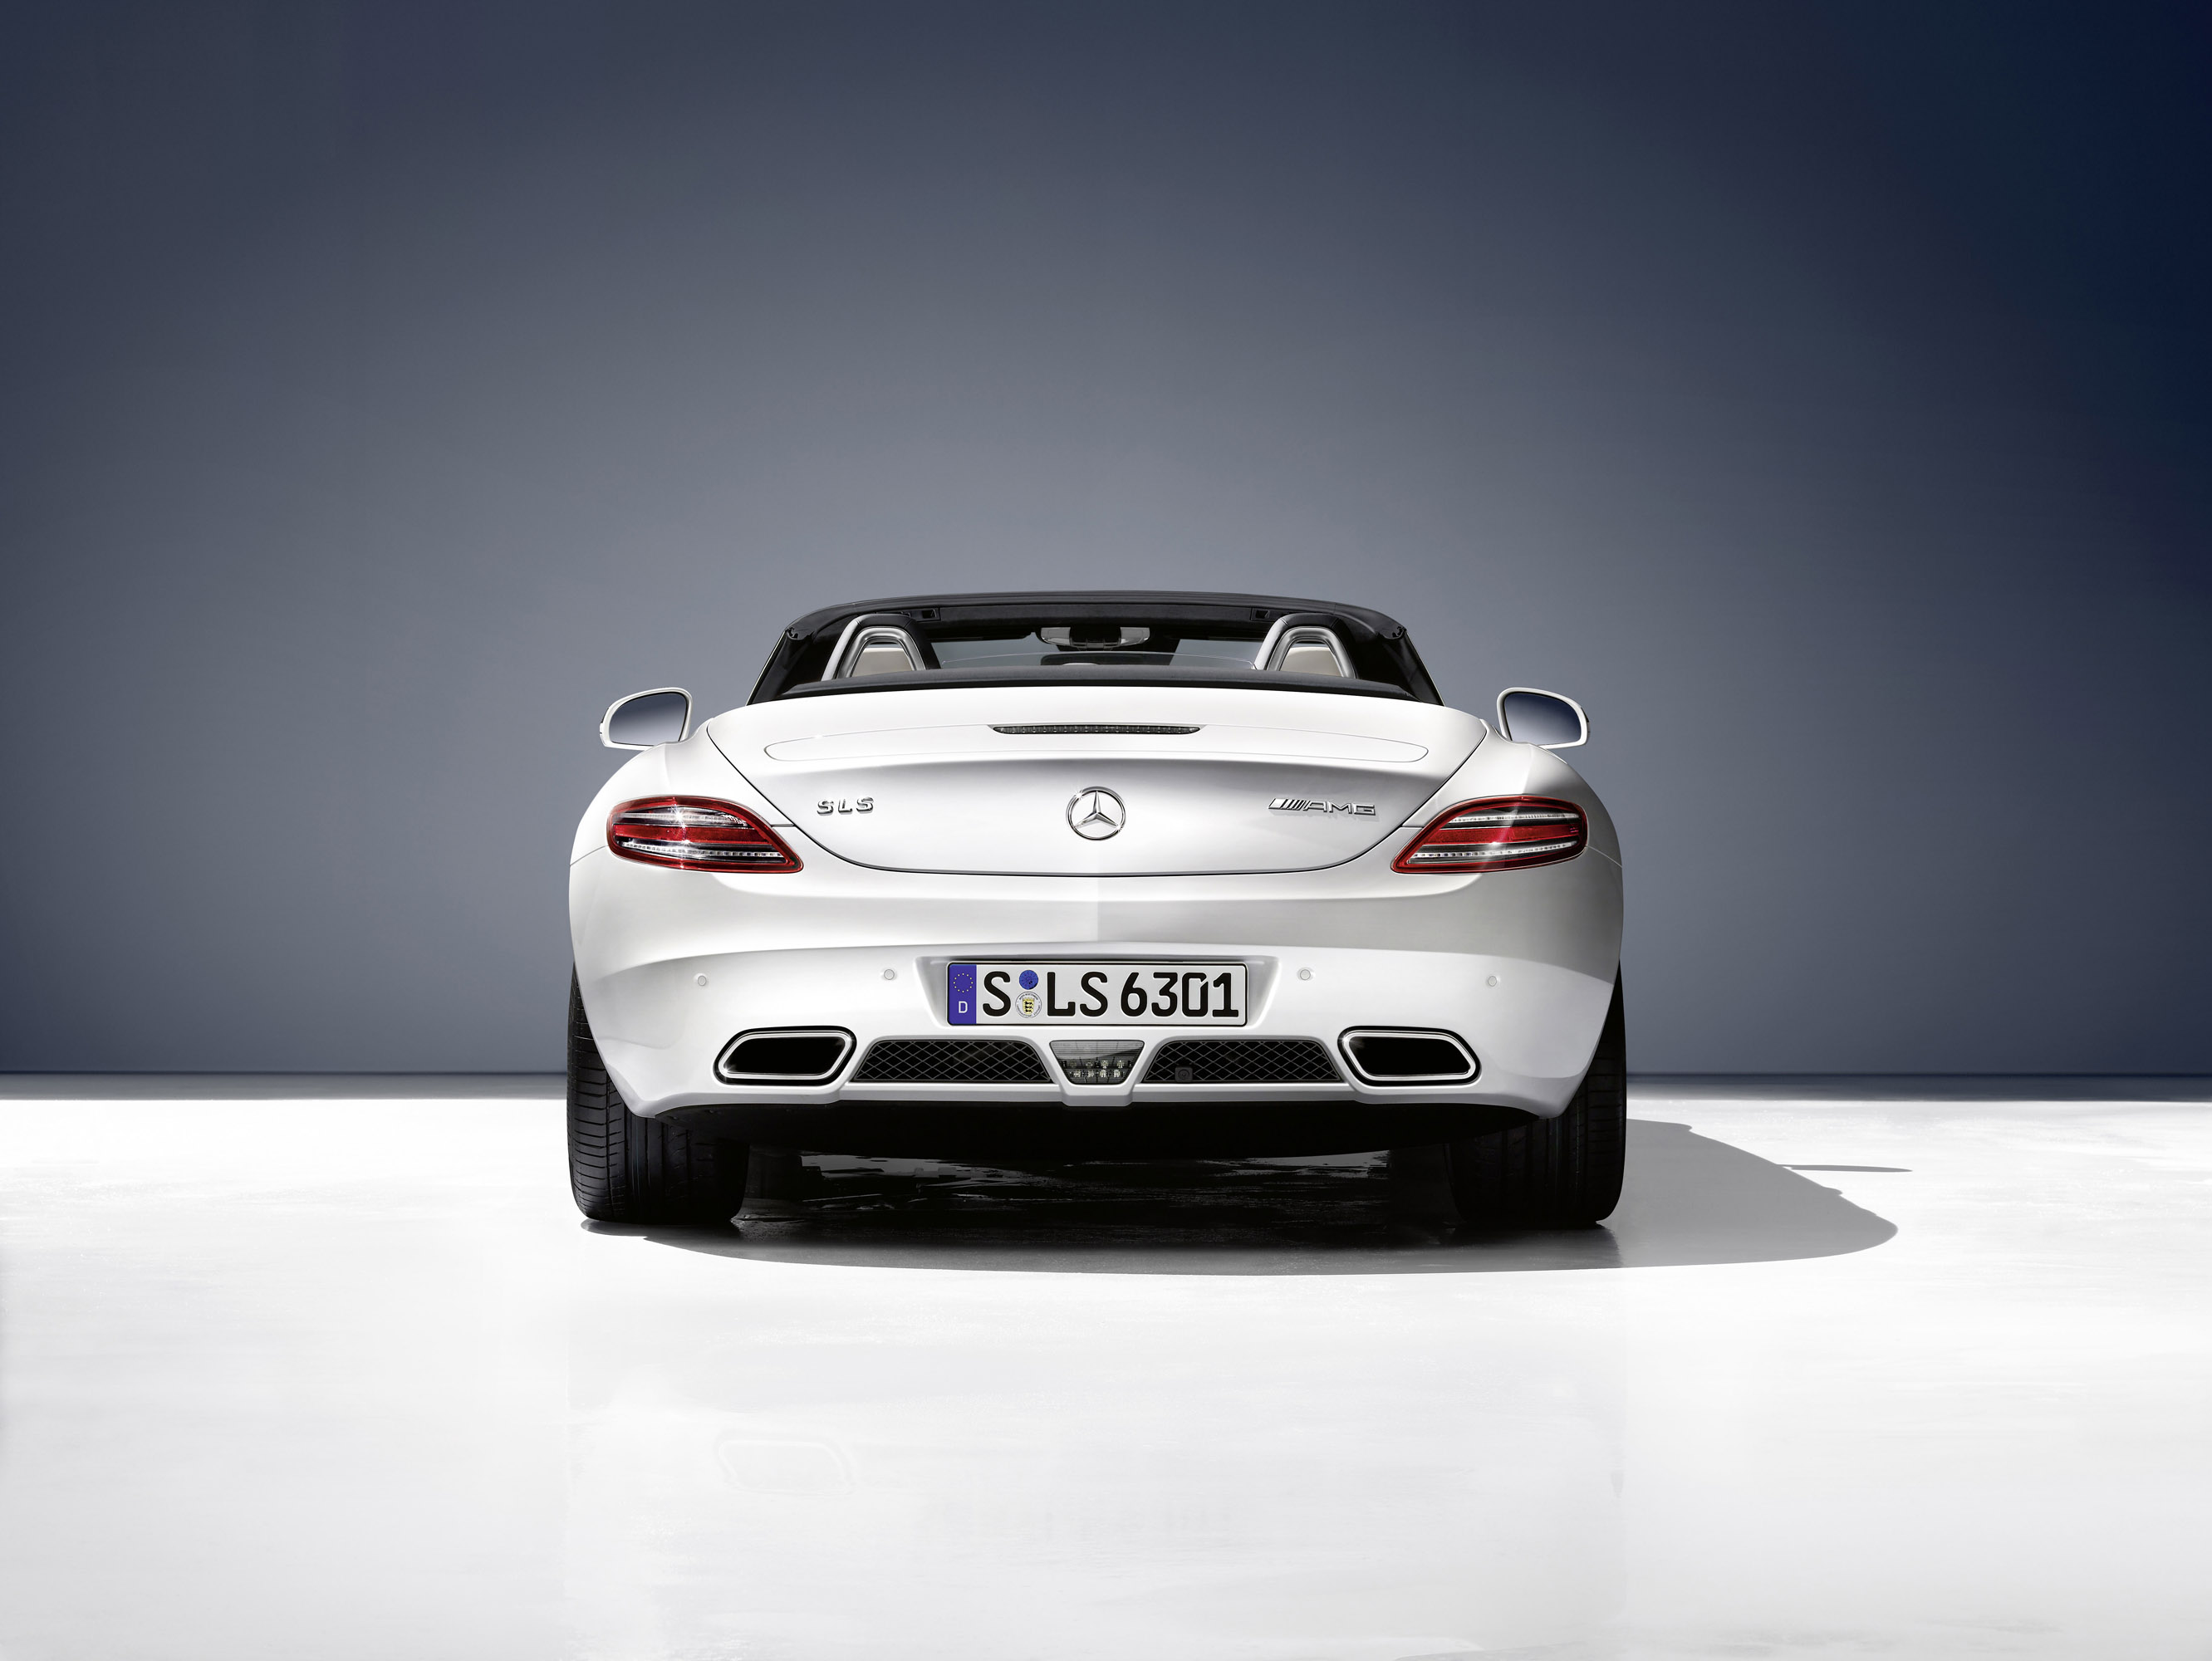 2012 mercedes sls amg roadster for Mercedes benz sls 2012